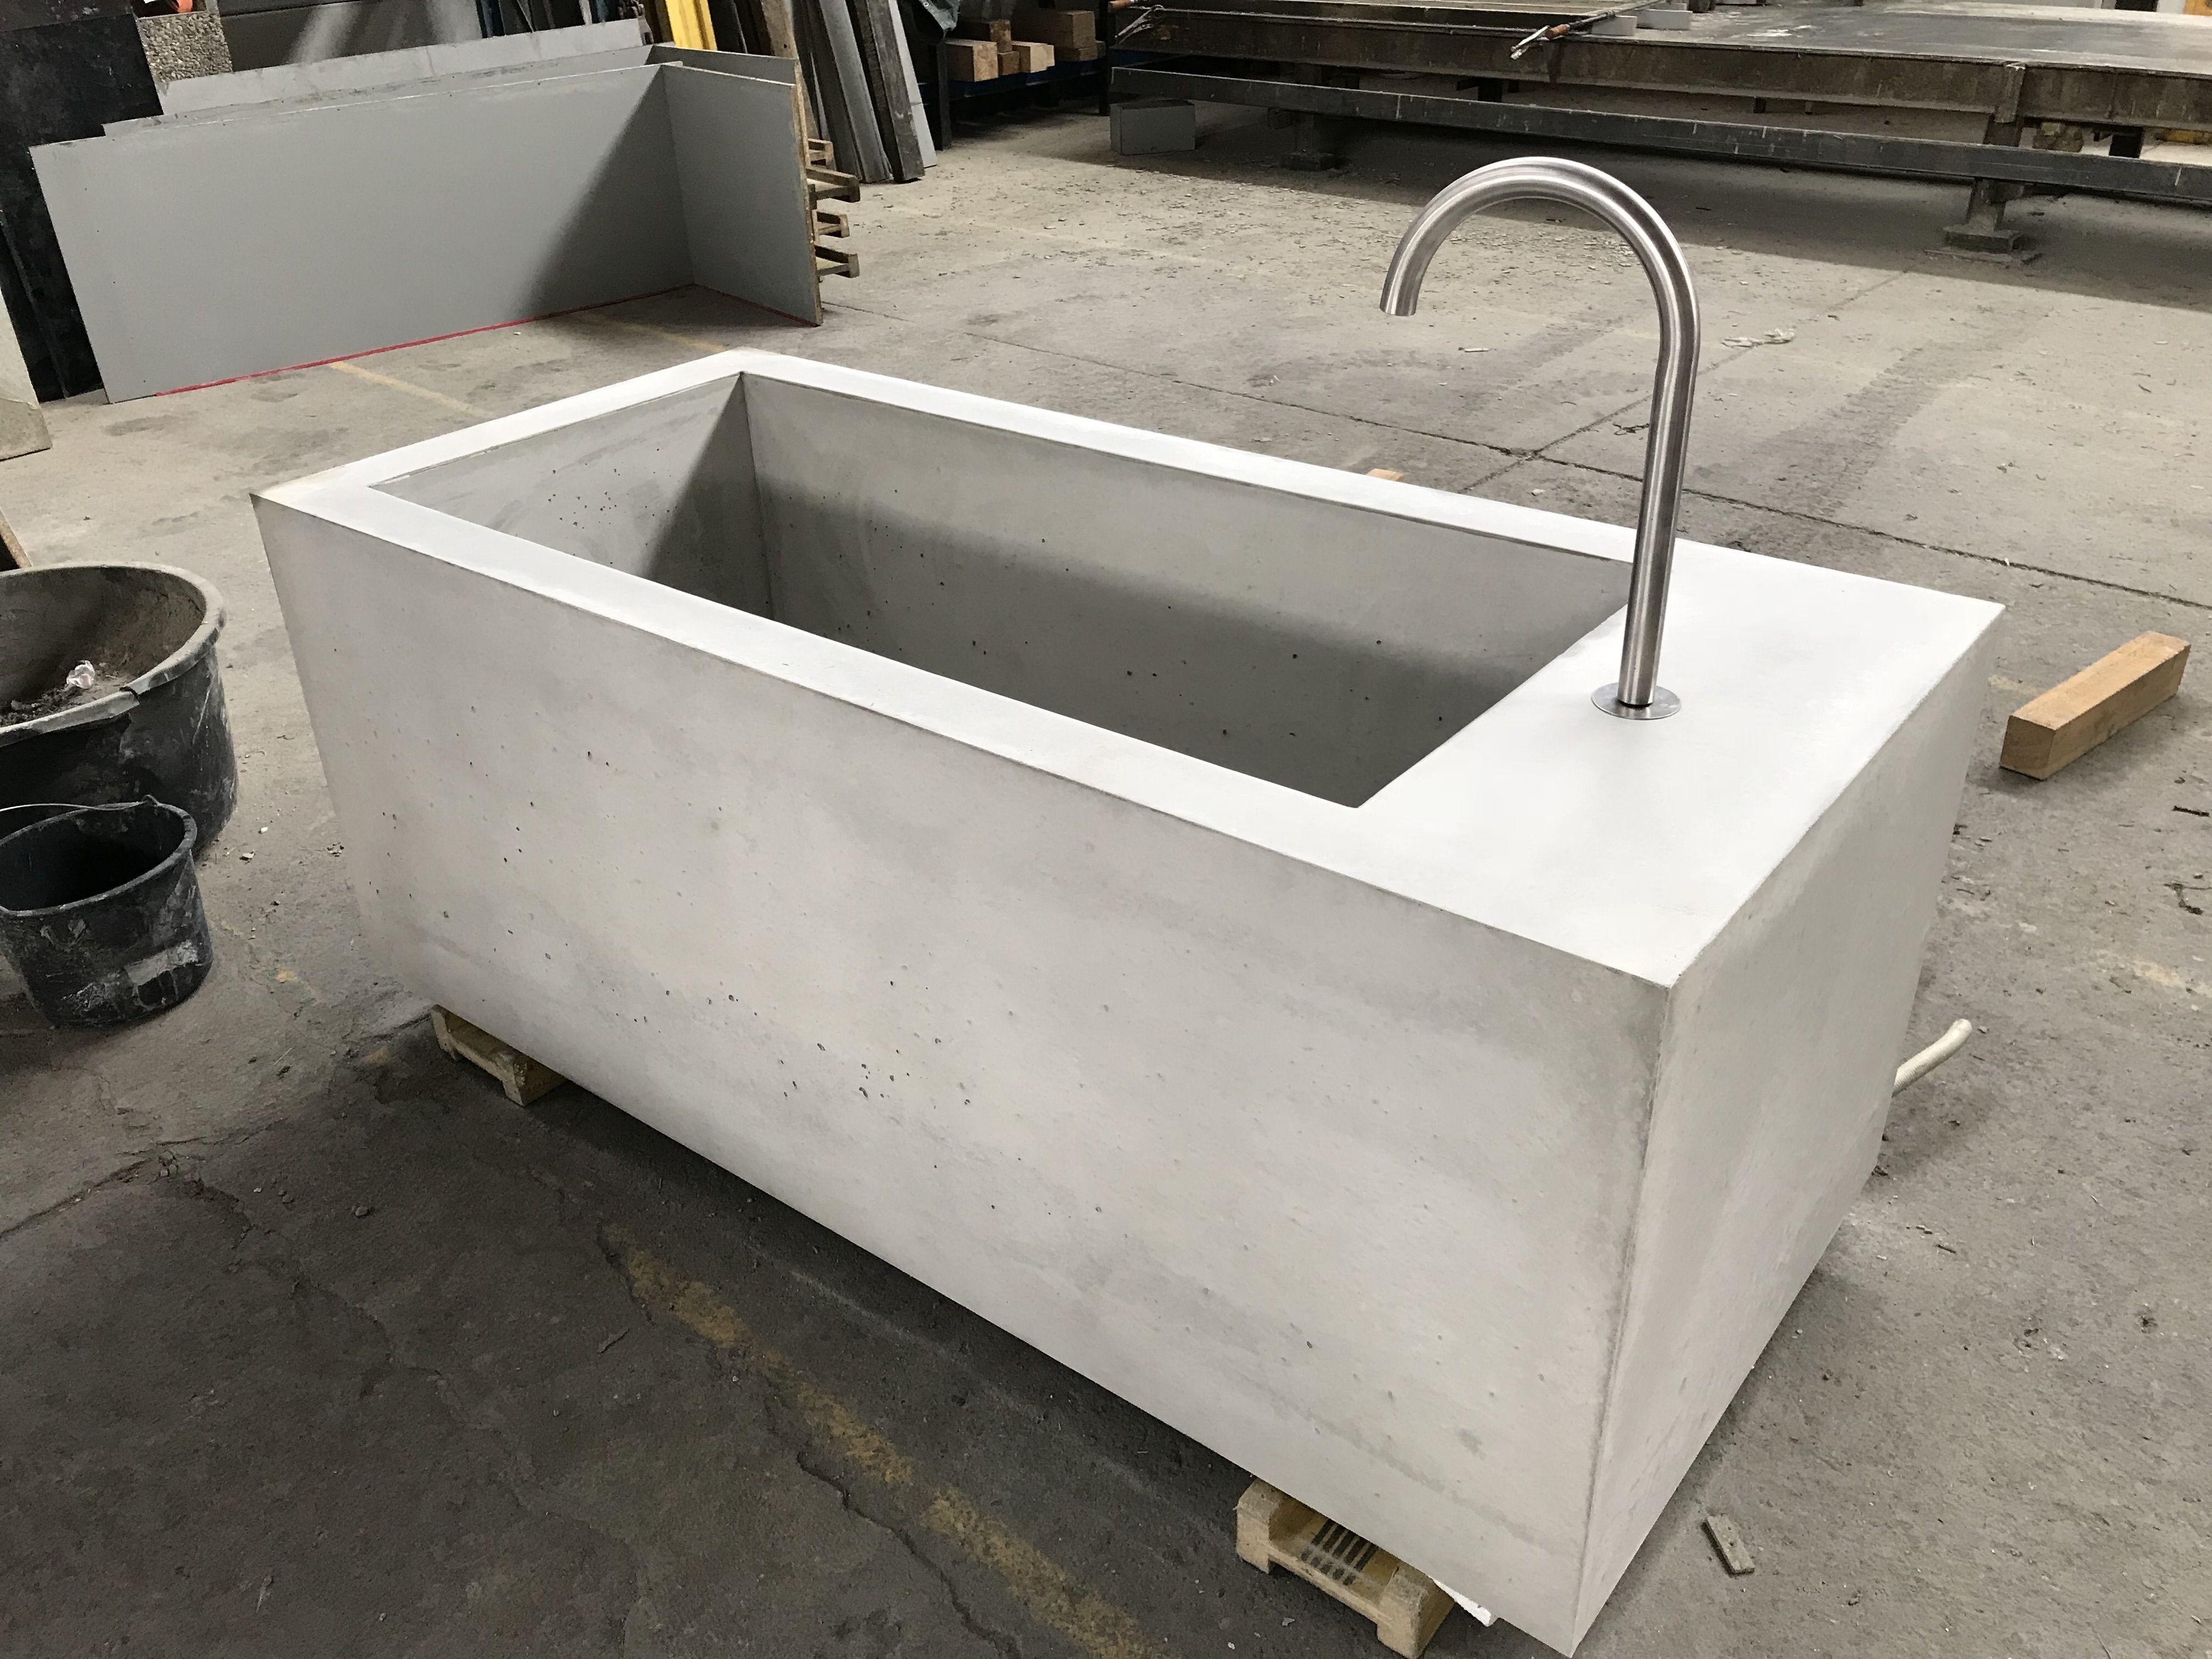 betontrog, betonbecken, wasserbecken, betonpool, betonwanne